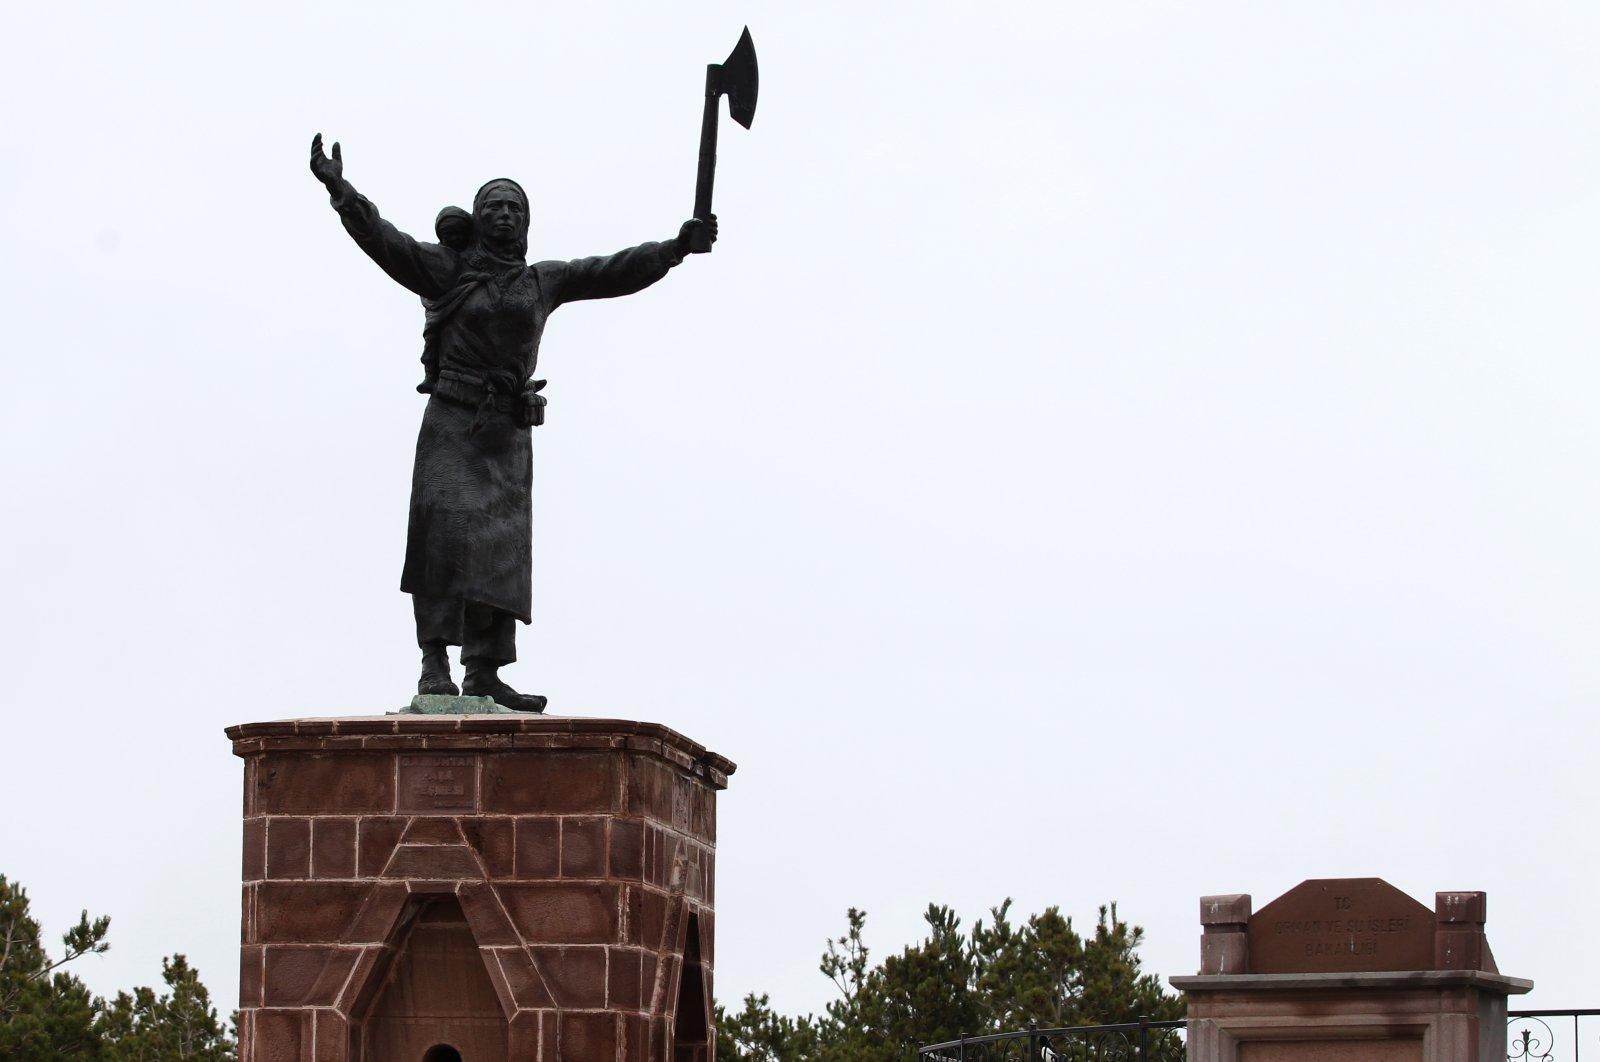 A statue depicting Nene Hatun in eastern Erzurum province, Turkey, May 22, 2021.